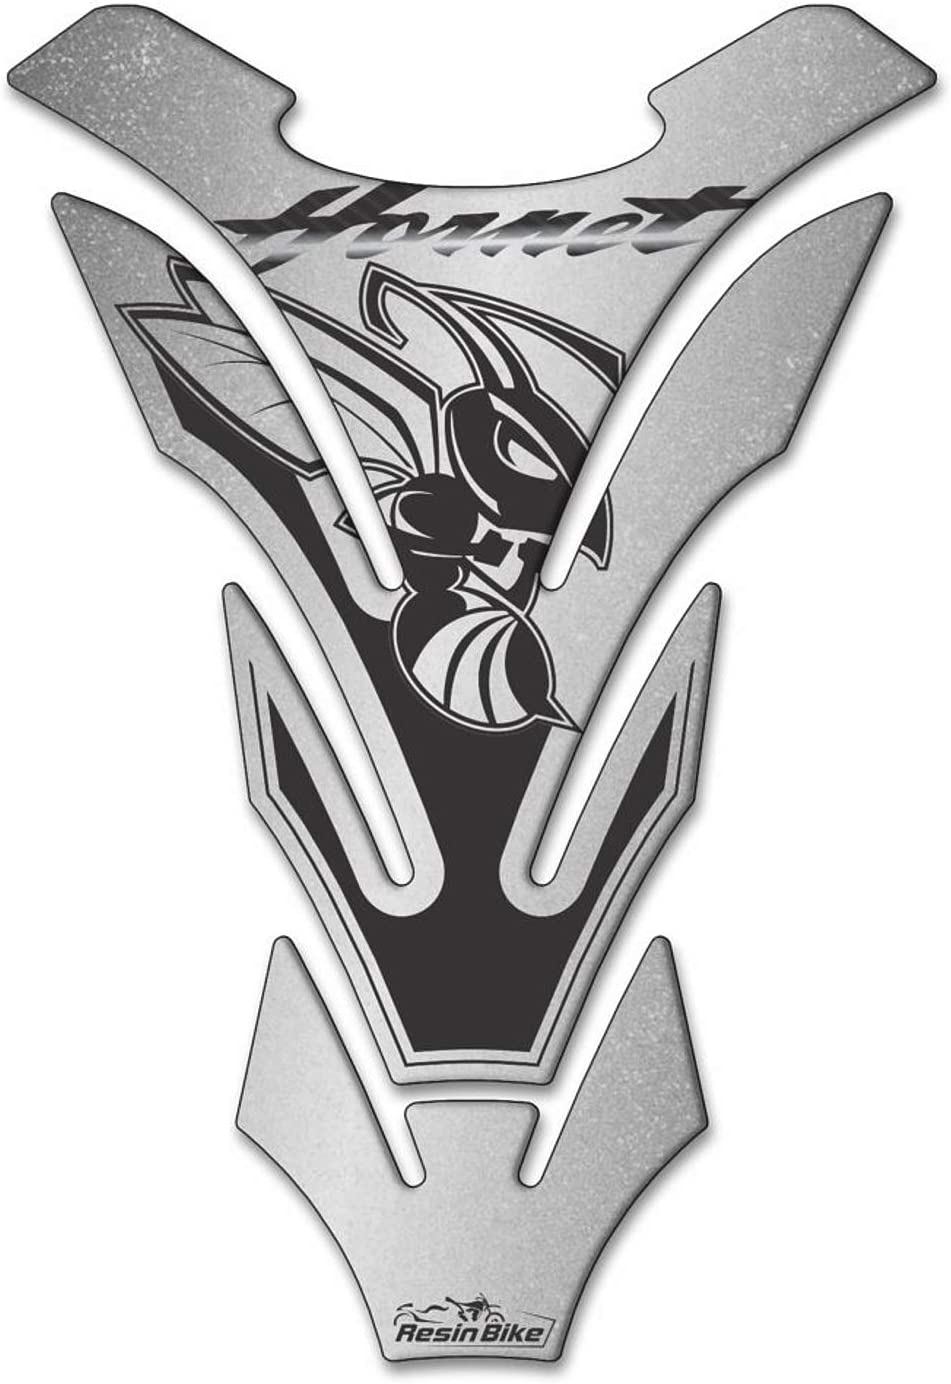 Paraserbatoio Universale Per Honda Hornet Argento Metallizzato